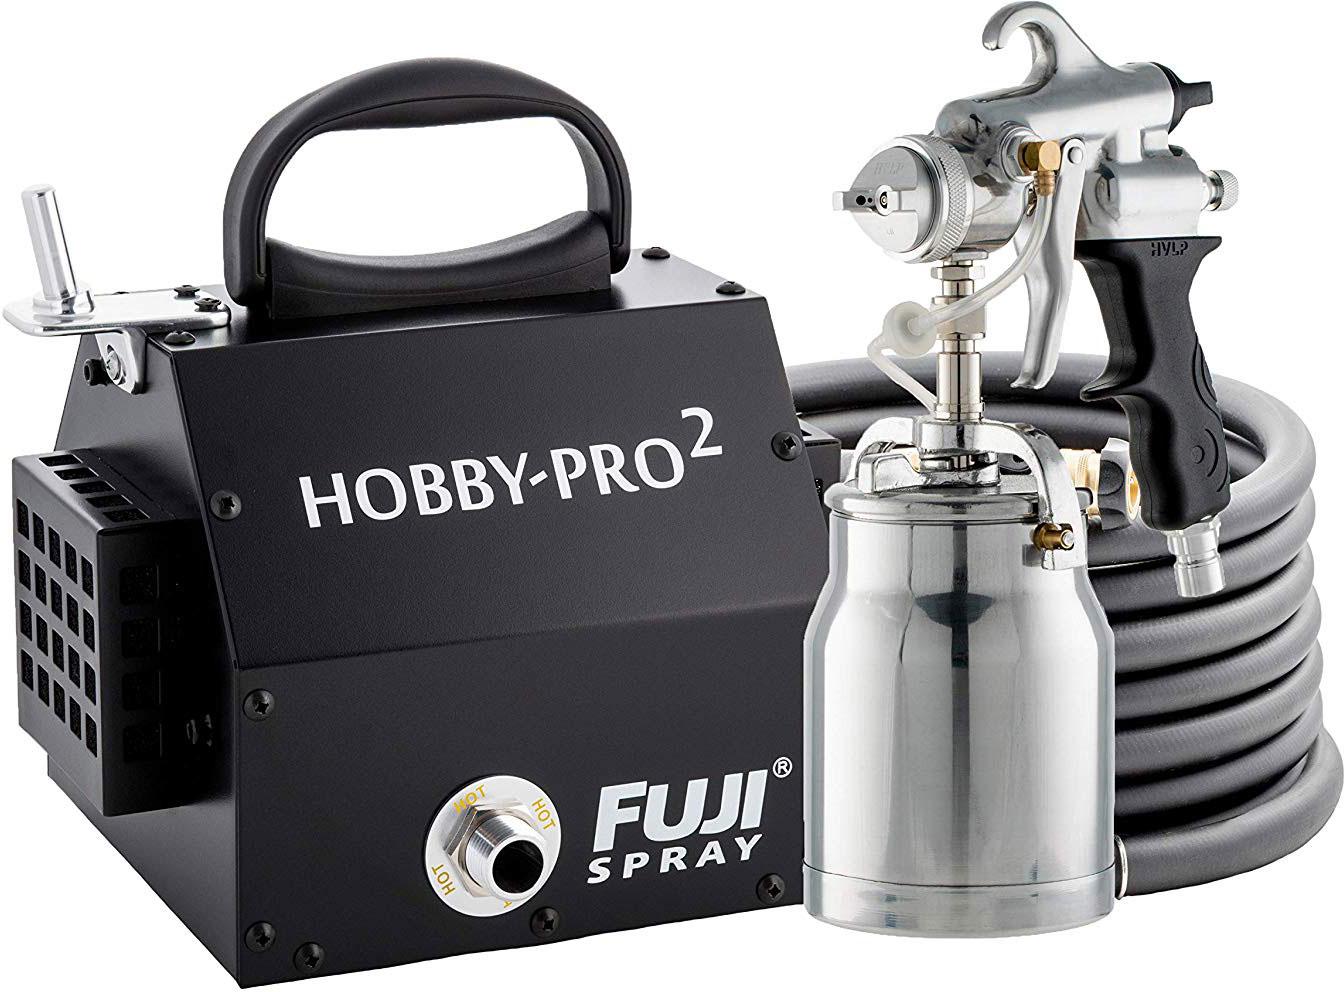 Hobby-PRO 2™ HVLP System